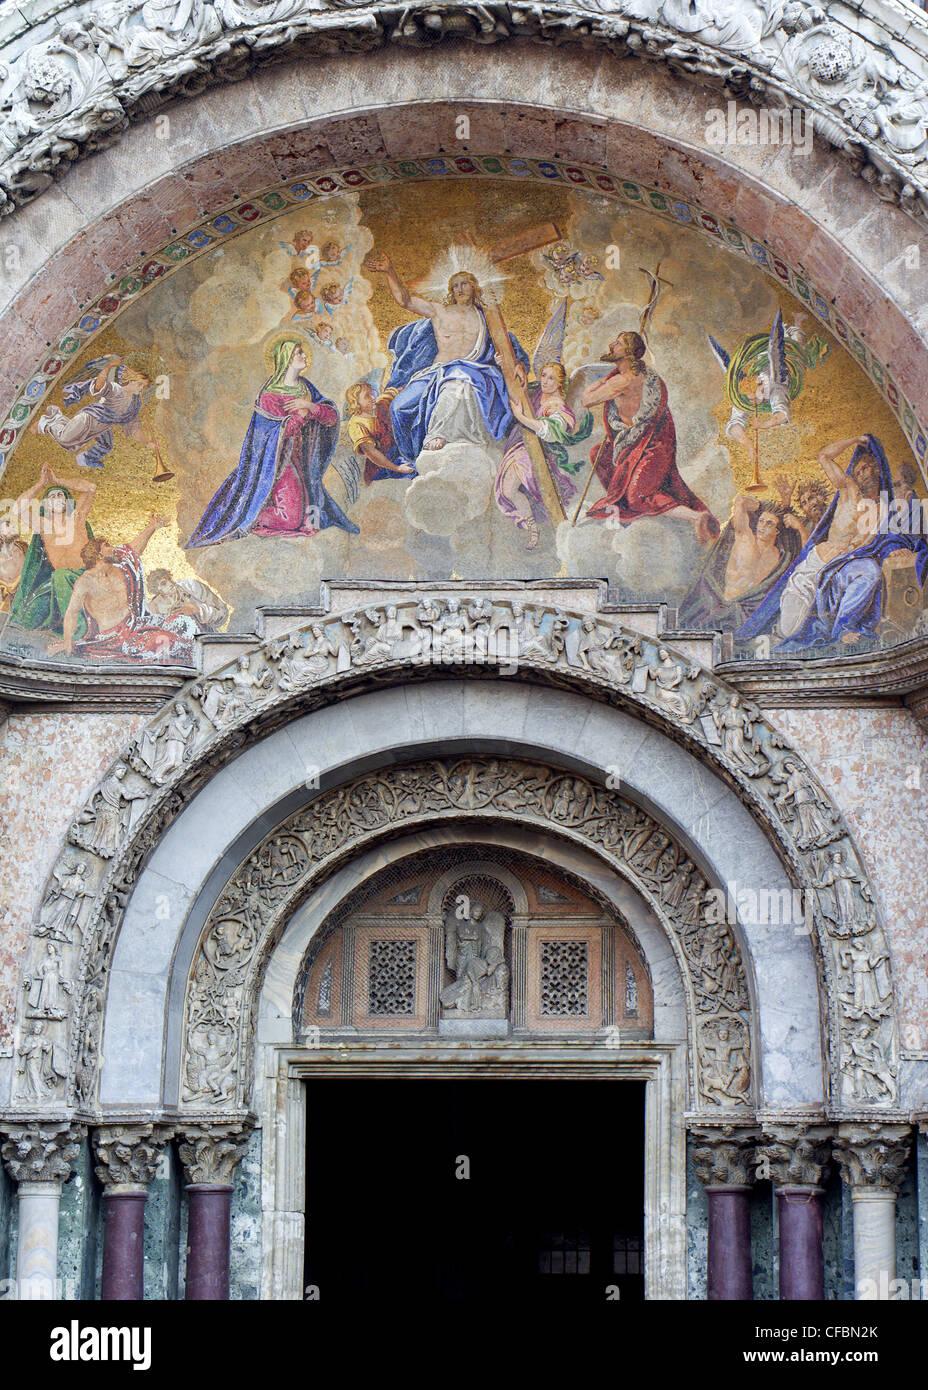 Venice - main portal of Basilica San Marco Stock Photo: 43898587 - Alamy